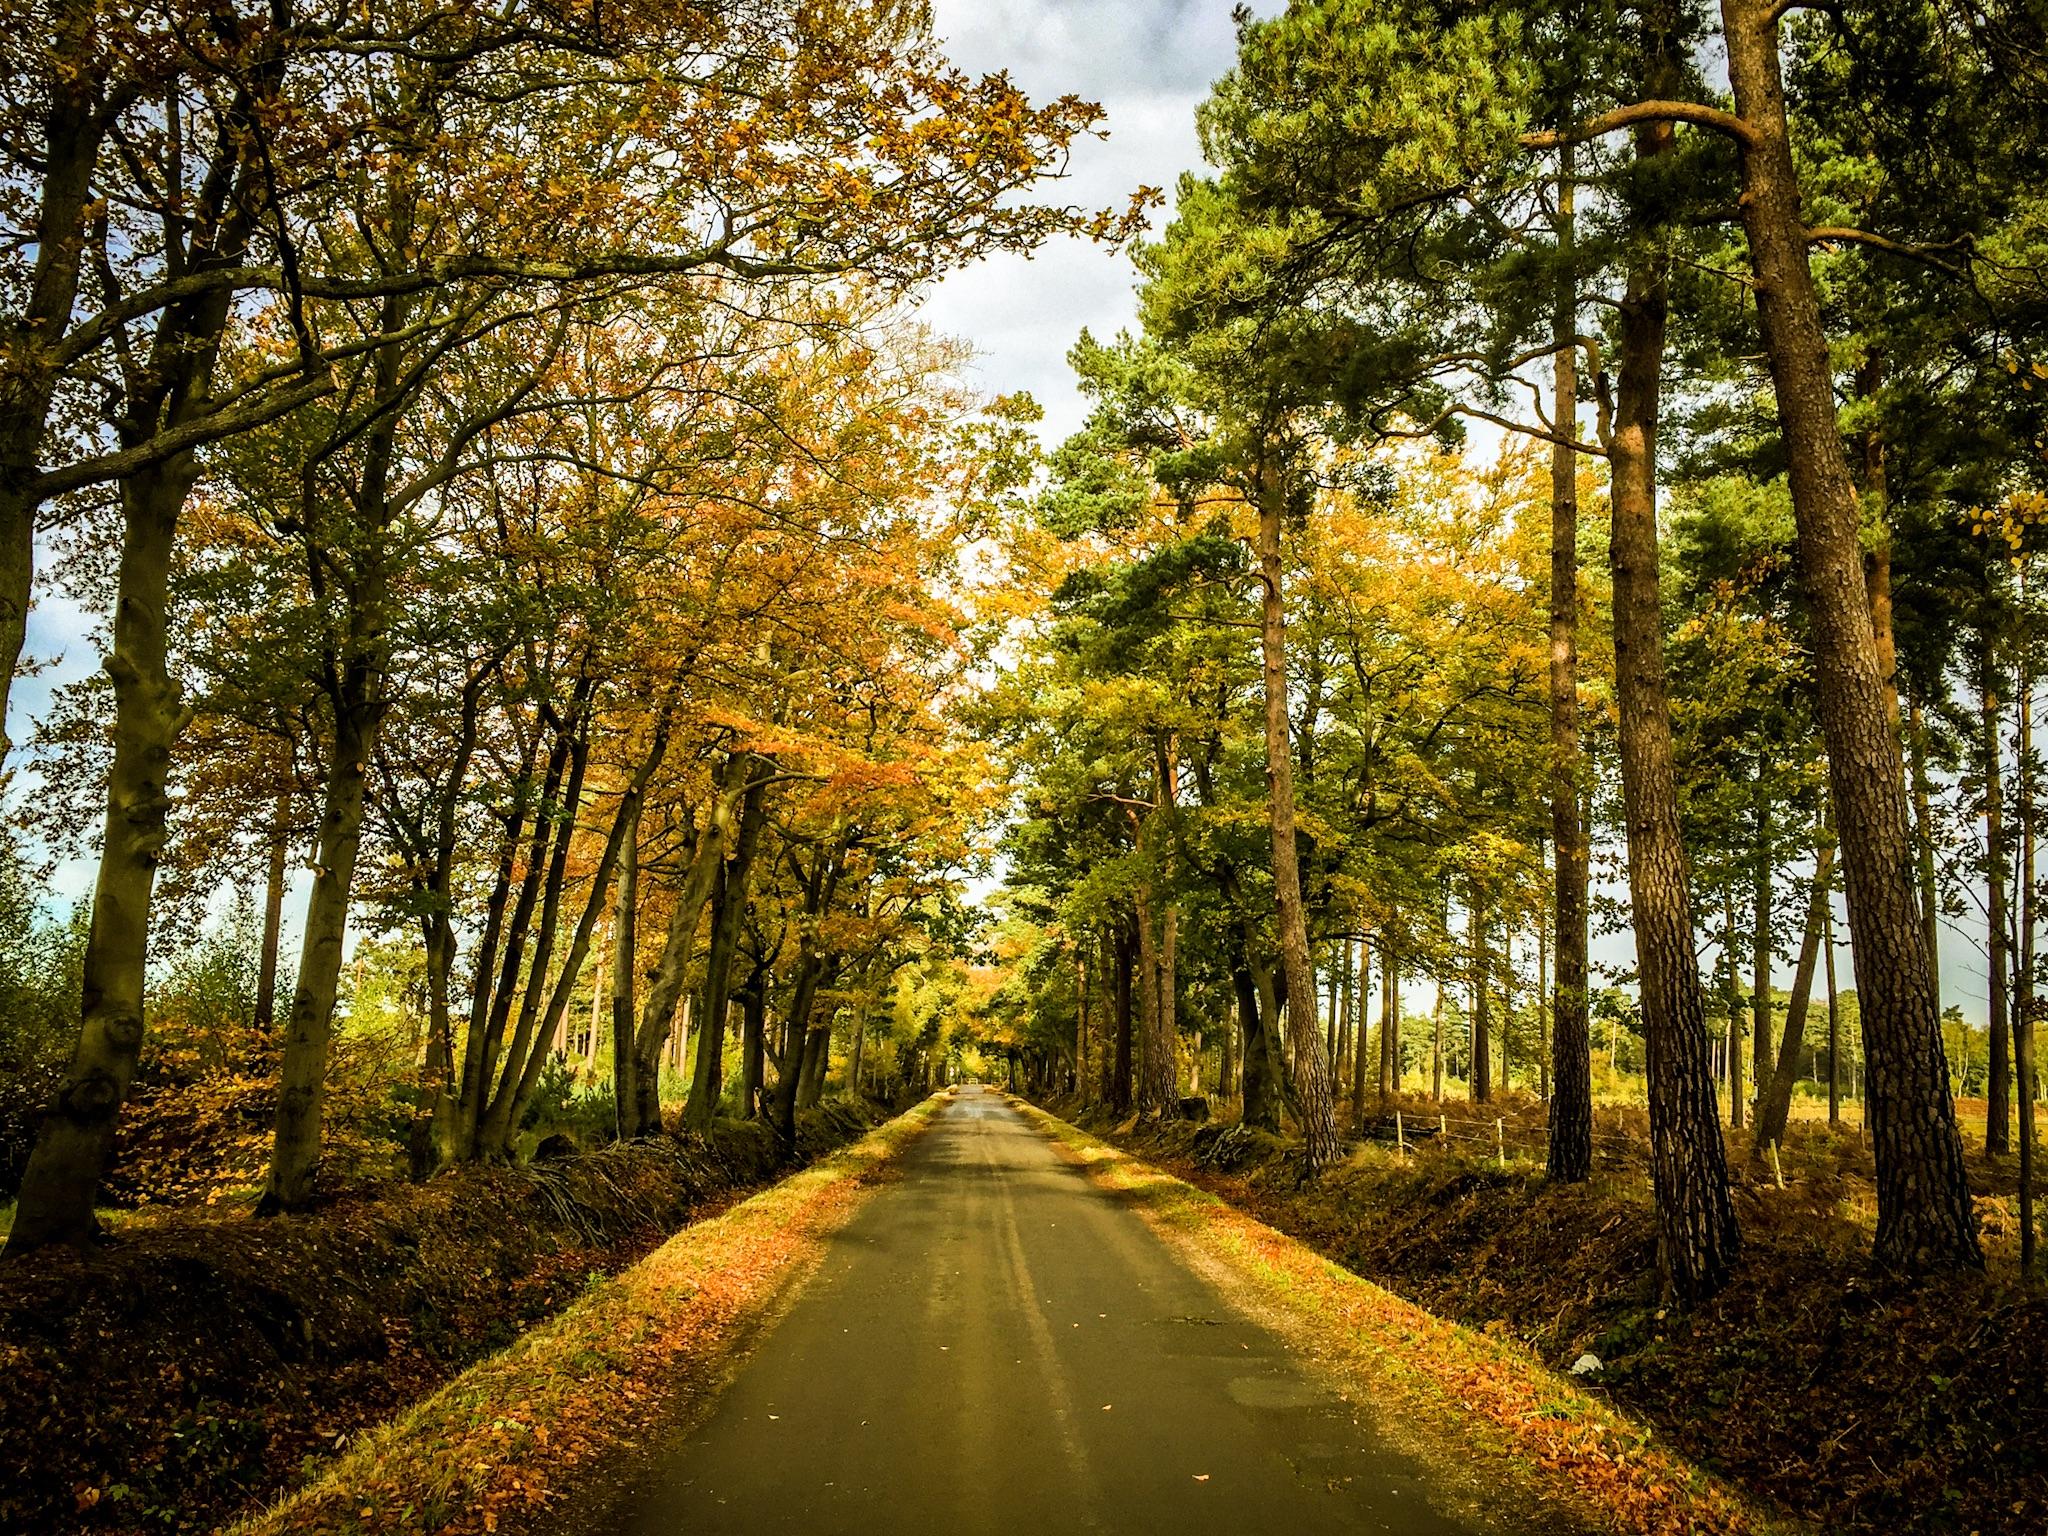 Golden light in this autumn scene by Rick McEvoy landscape photographer